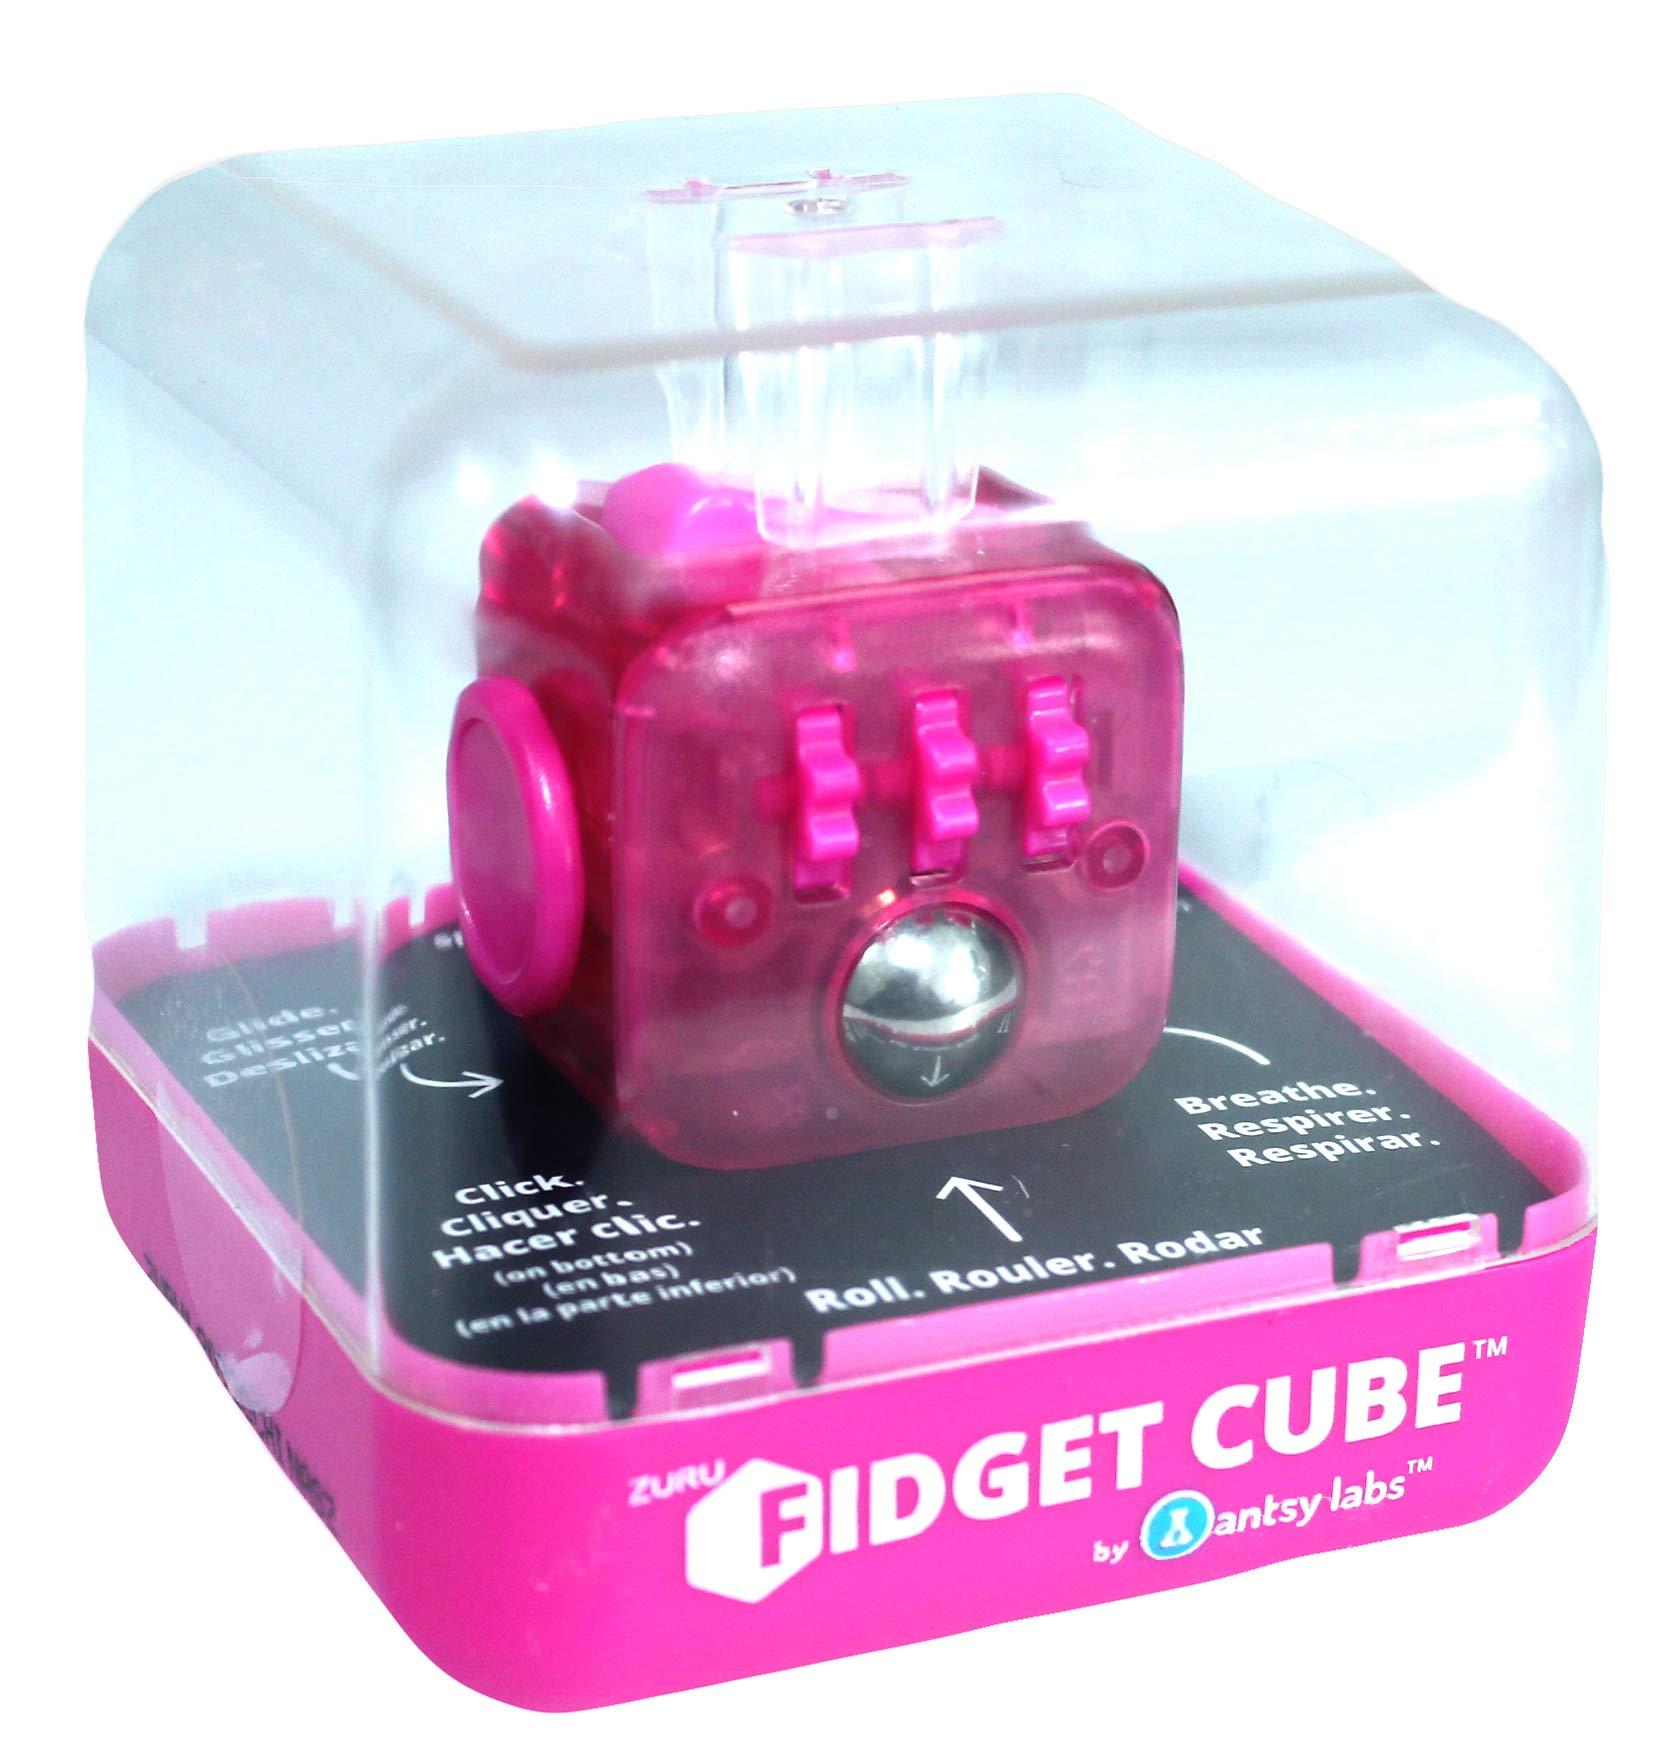 Zuru Fidget Cube by Antsy Labs - Custom Series (Solid Pink Switch) Hot Pink Fidget Cube by Zuru Fidget Cube by Antsy Labs (Image #2)